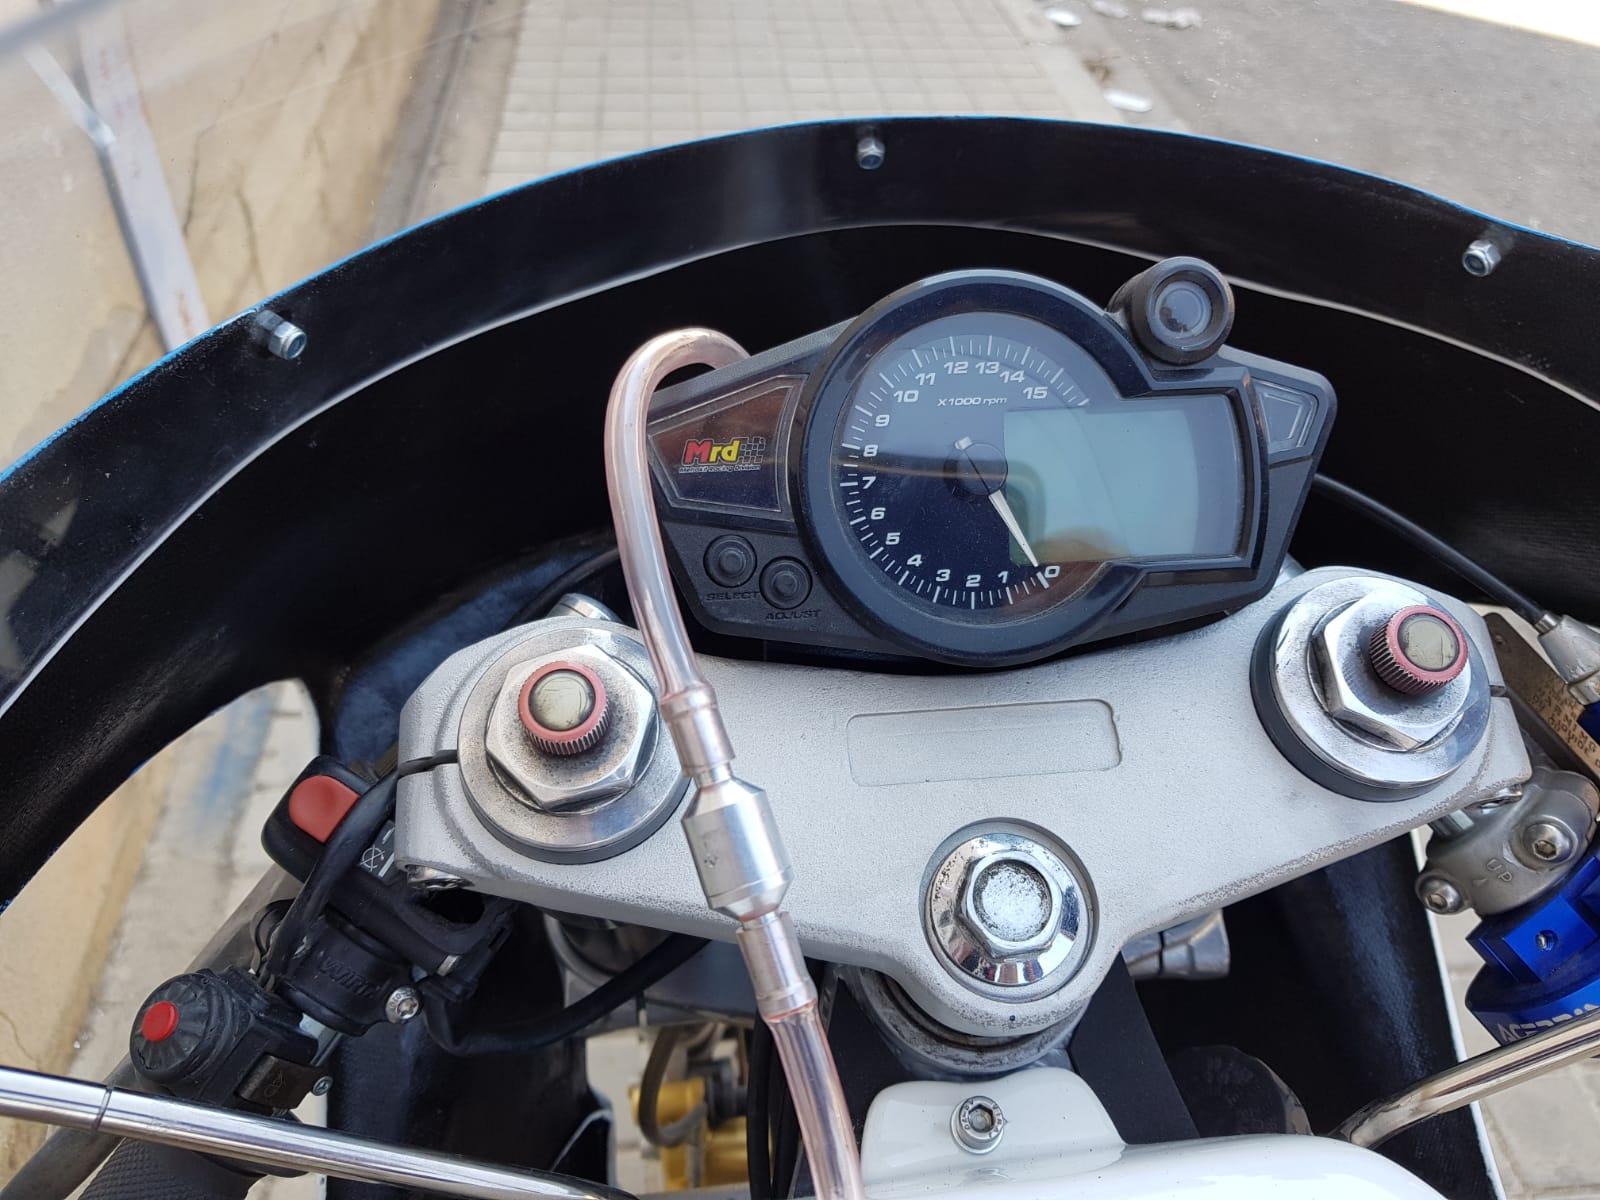 MH 003 JJ.COBAS Moto Hernan Zmdpap